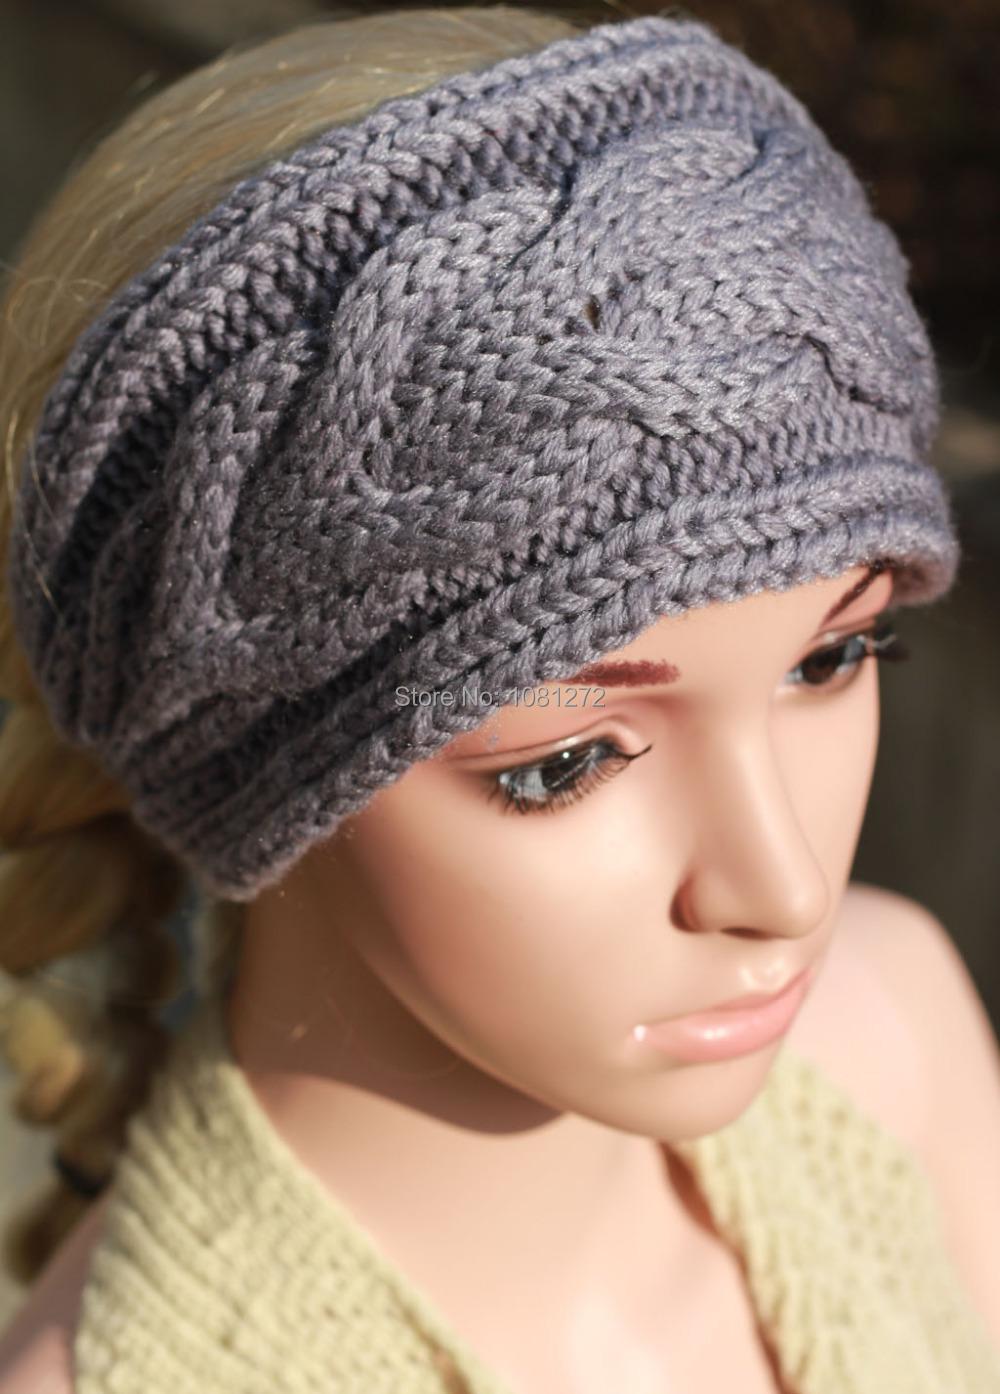 Headband Head Wrap Knitting Pattern : Light Gray Knit Headband,Cute Turban Headband,Earwarmer ...